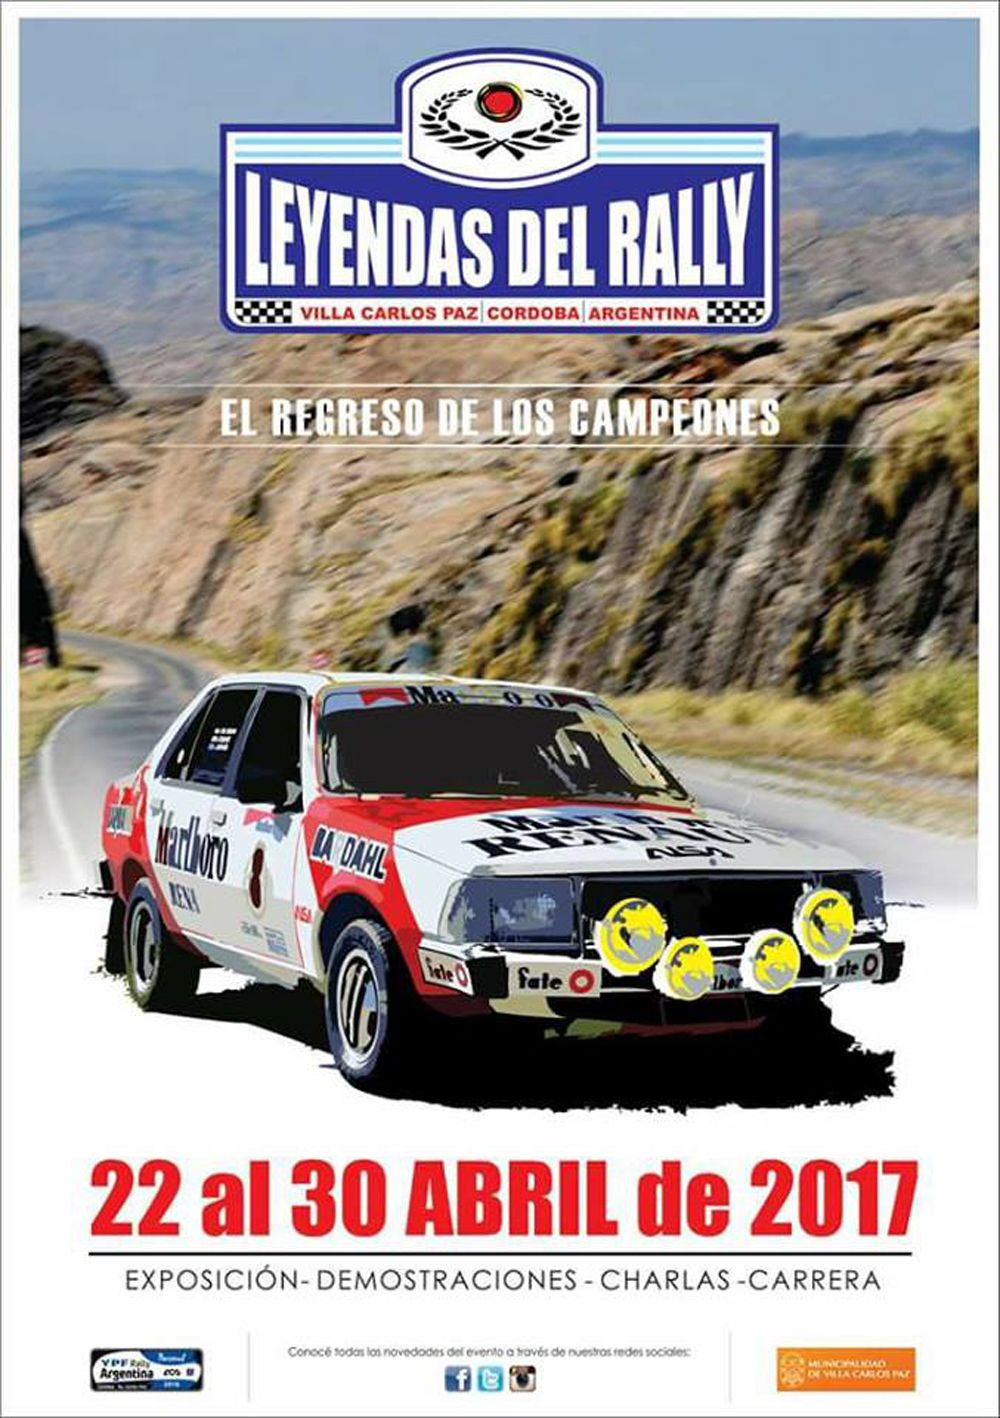 Leyendas del Rally 2017 Afiche